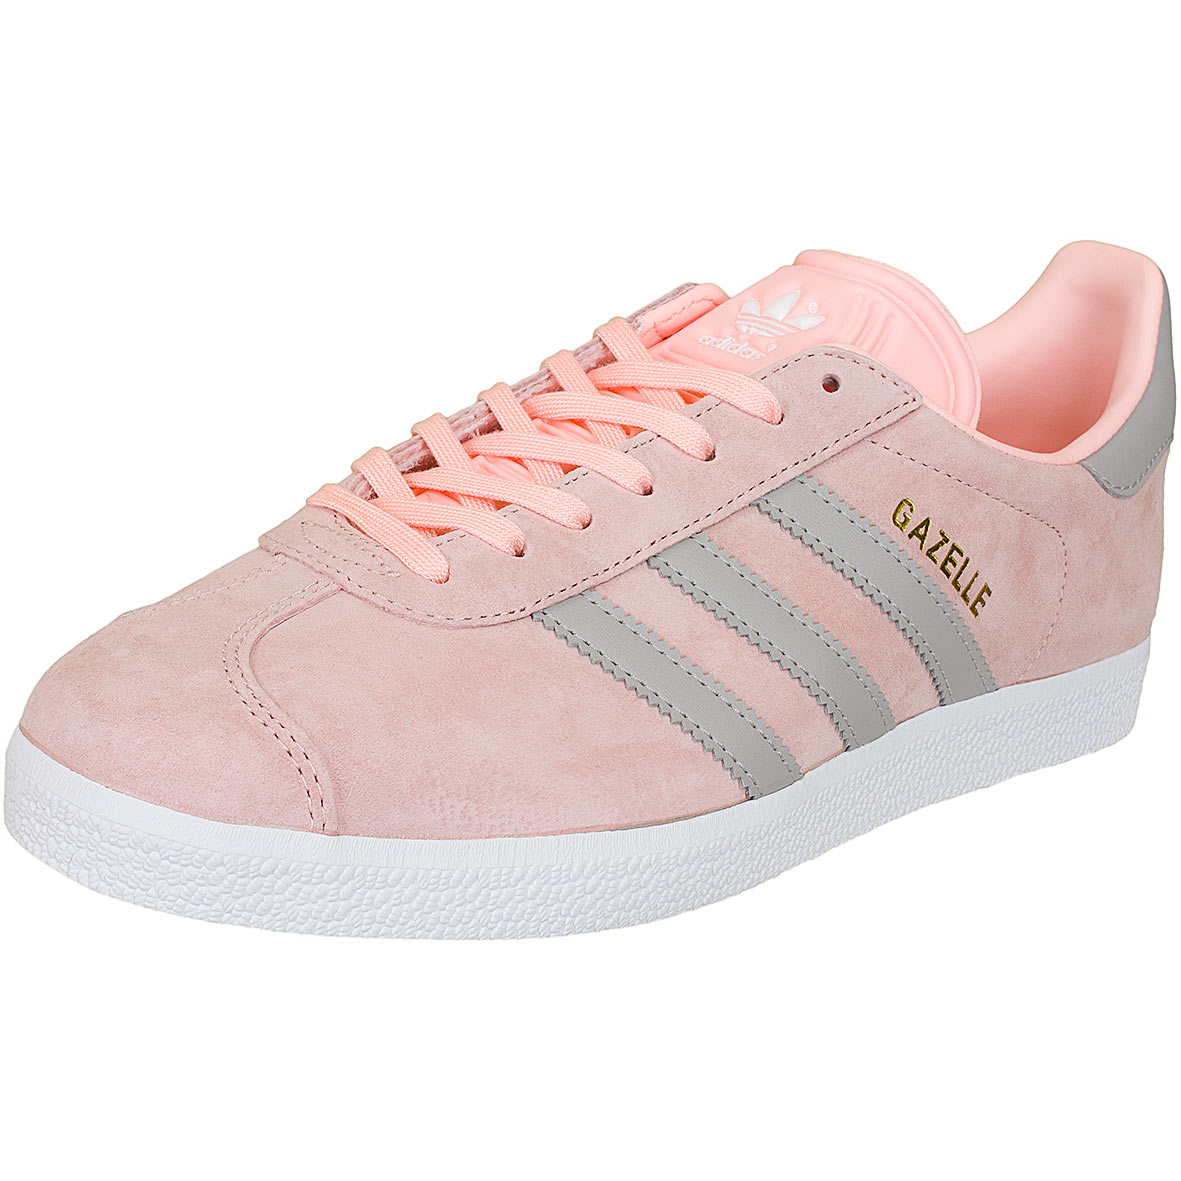 adidas originals damen sneaker gazelle rosa grau hier. Black Bedroom Furniture Sets. Home Design Ideas